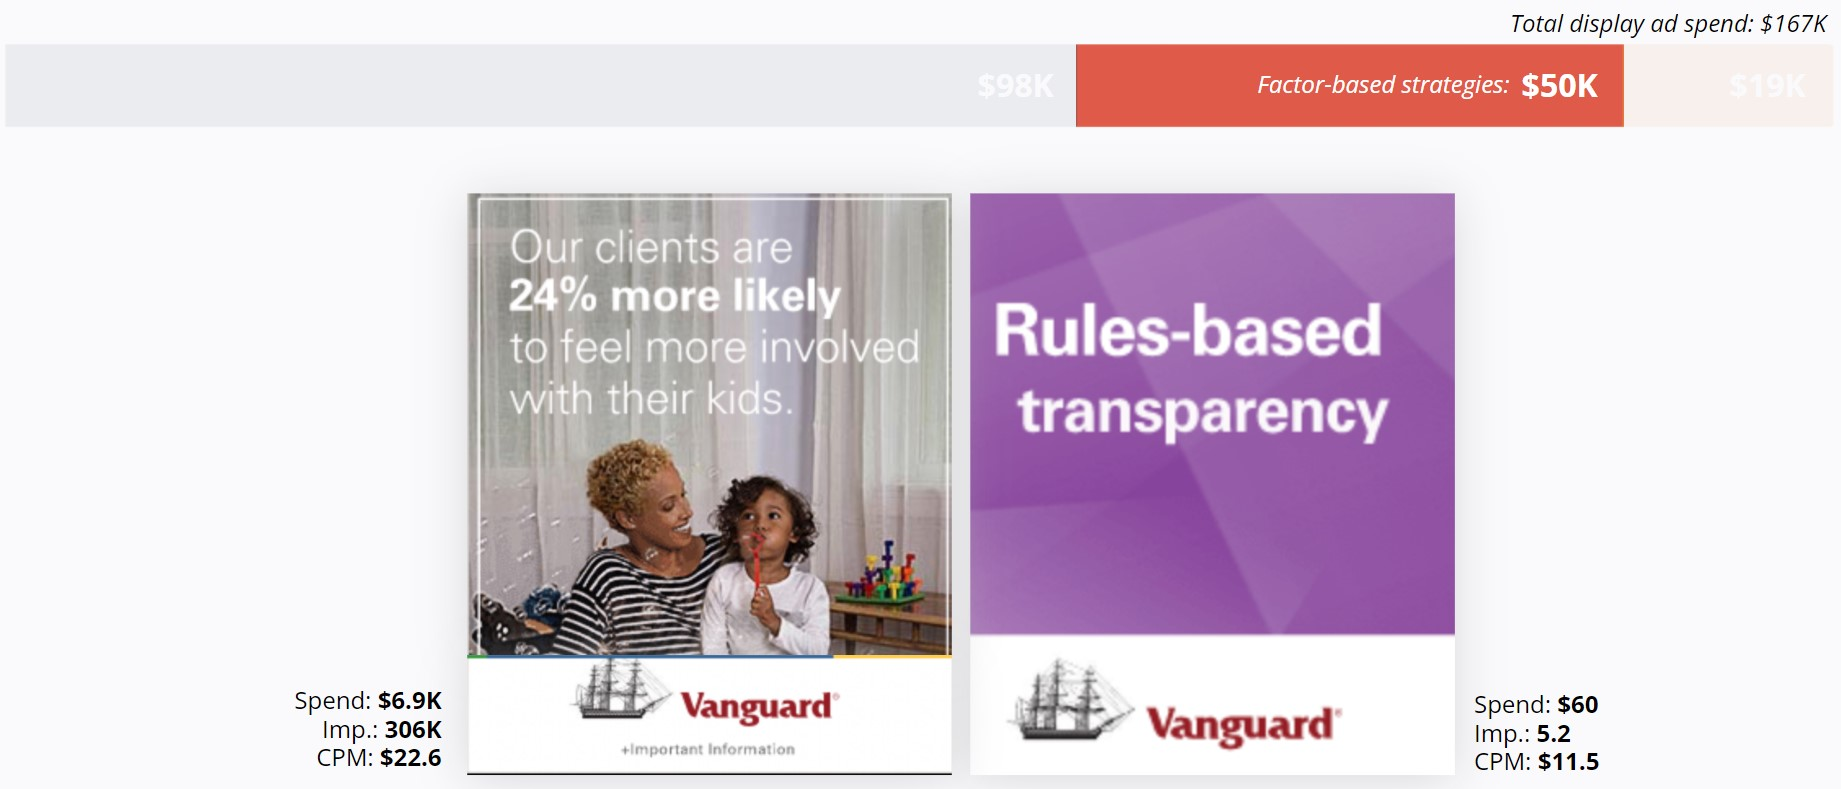 Vanguard - Display Ads Factor-Based Strategies Page